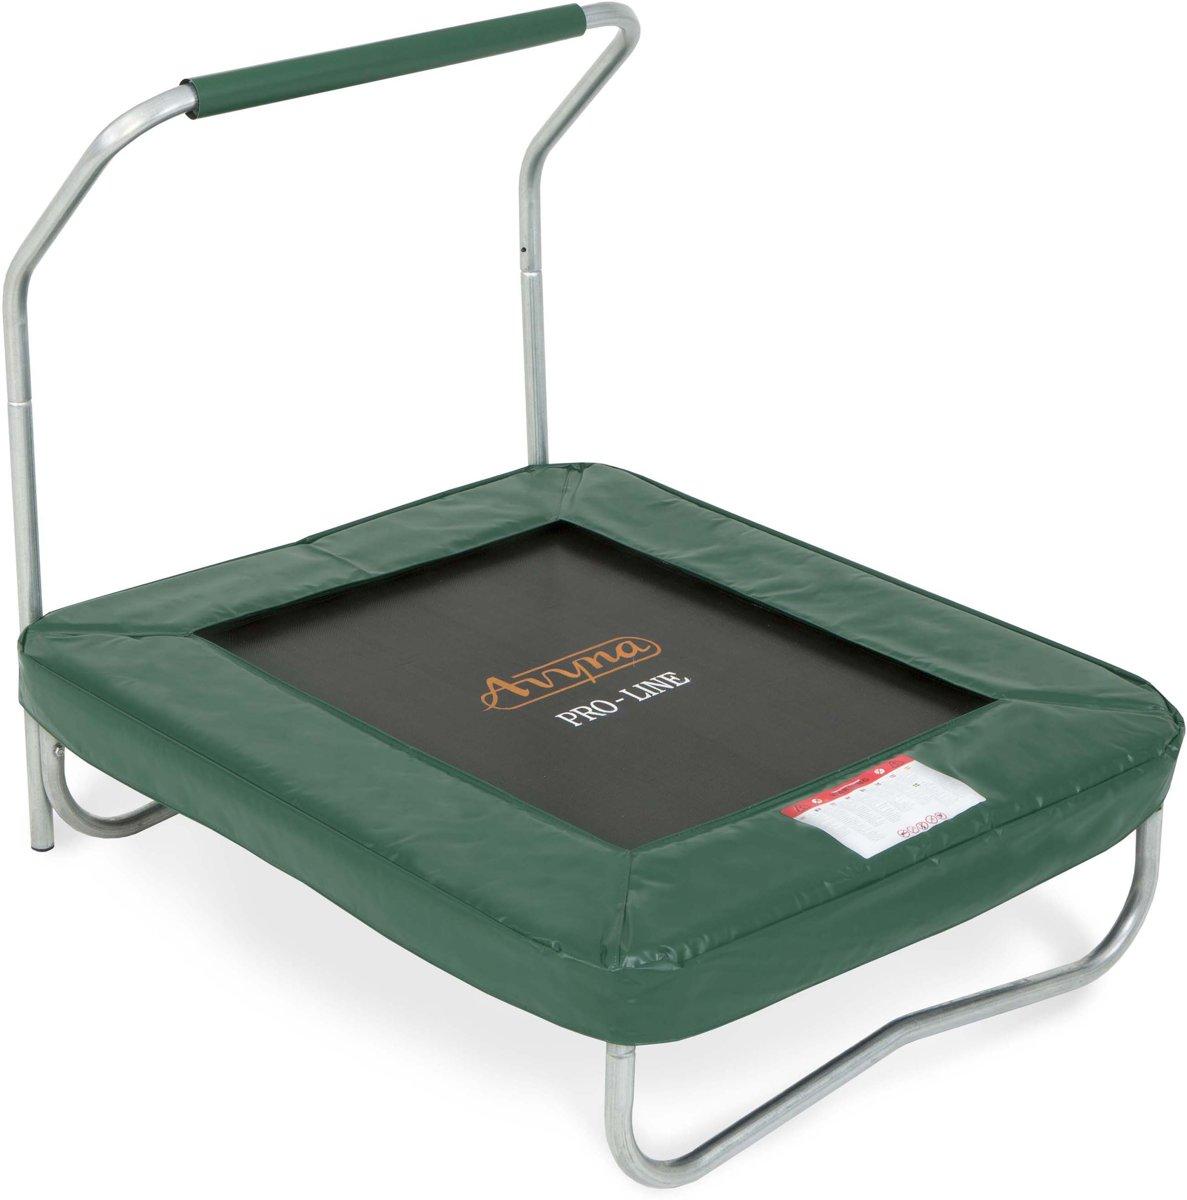 Avyna trampoline PRO-LINE 1,20 x 0,92 x 0,32 met beugel - Avyna Fitness